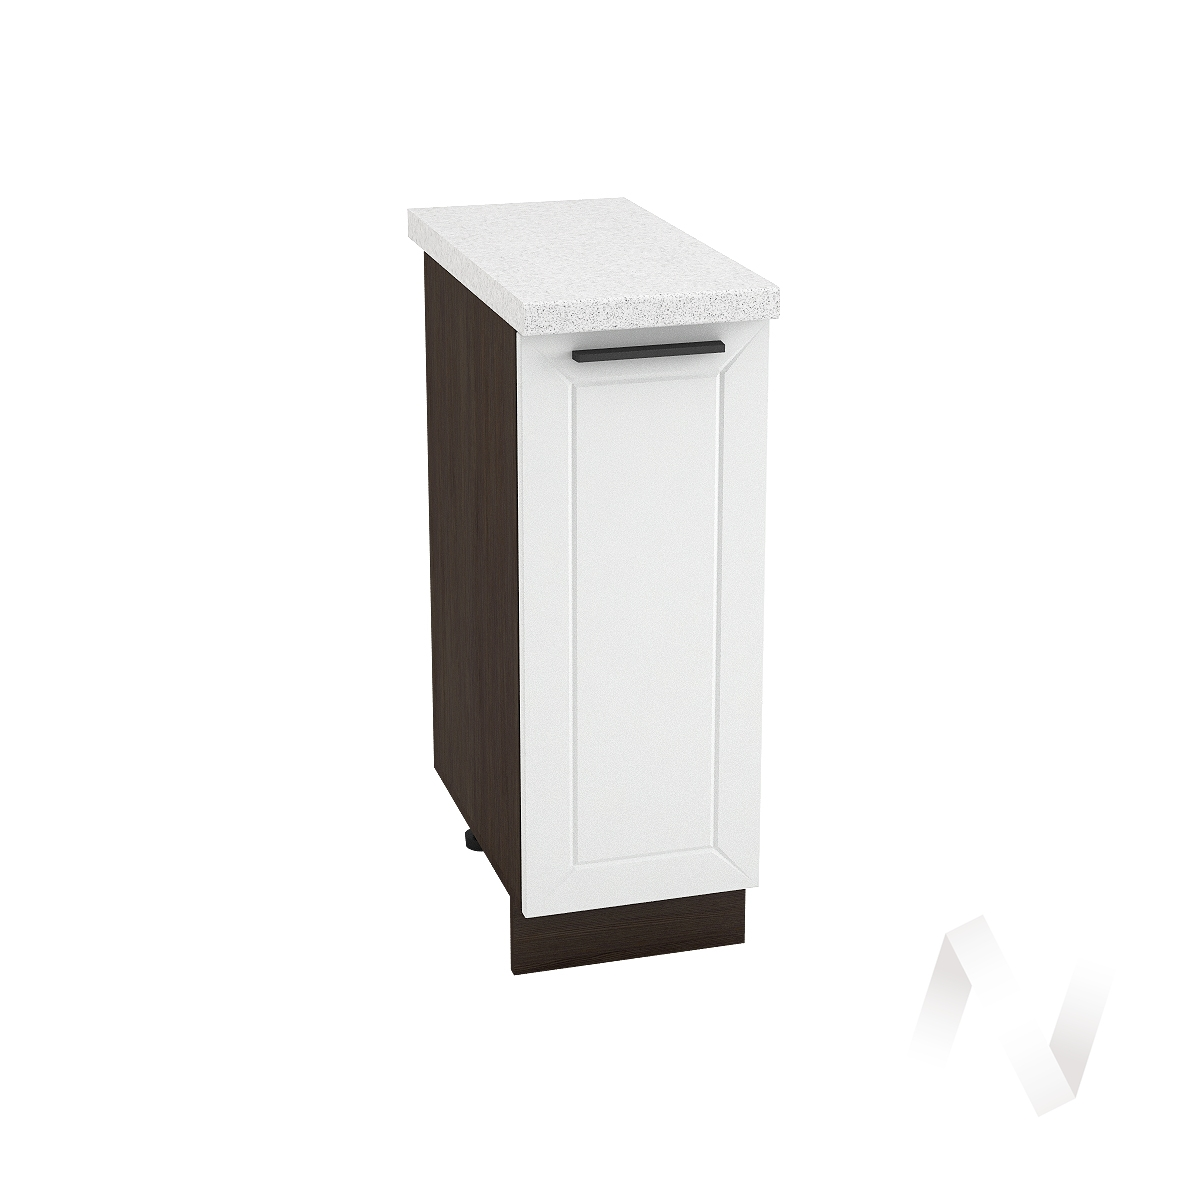 "Кухня ""Глетчер"": Шкаф нижний 300, ШН 300 (Айленд Силк/корпус венге)"